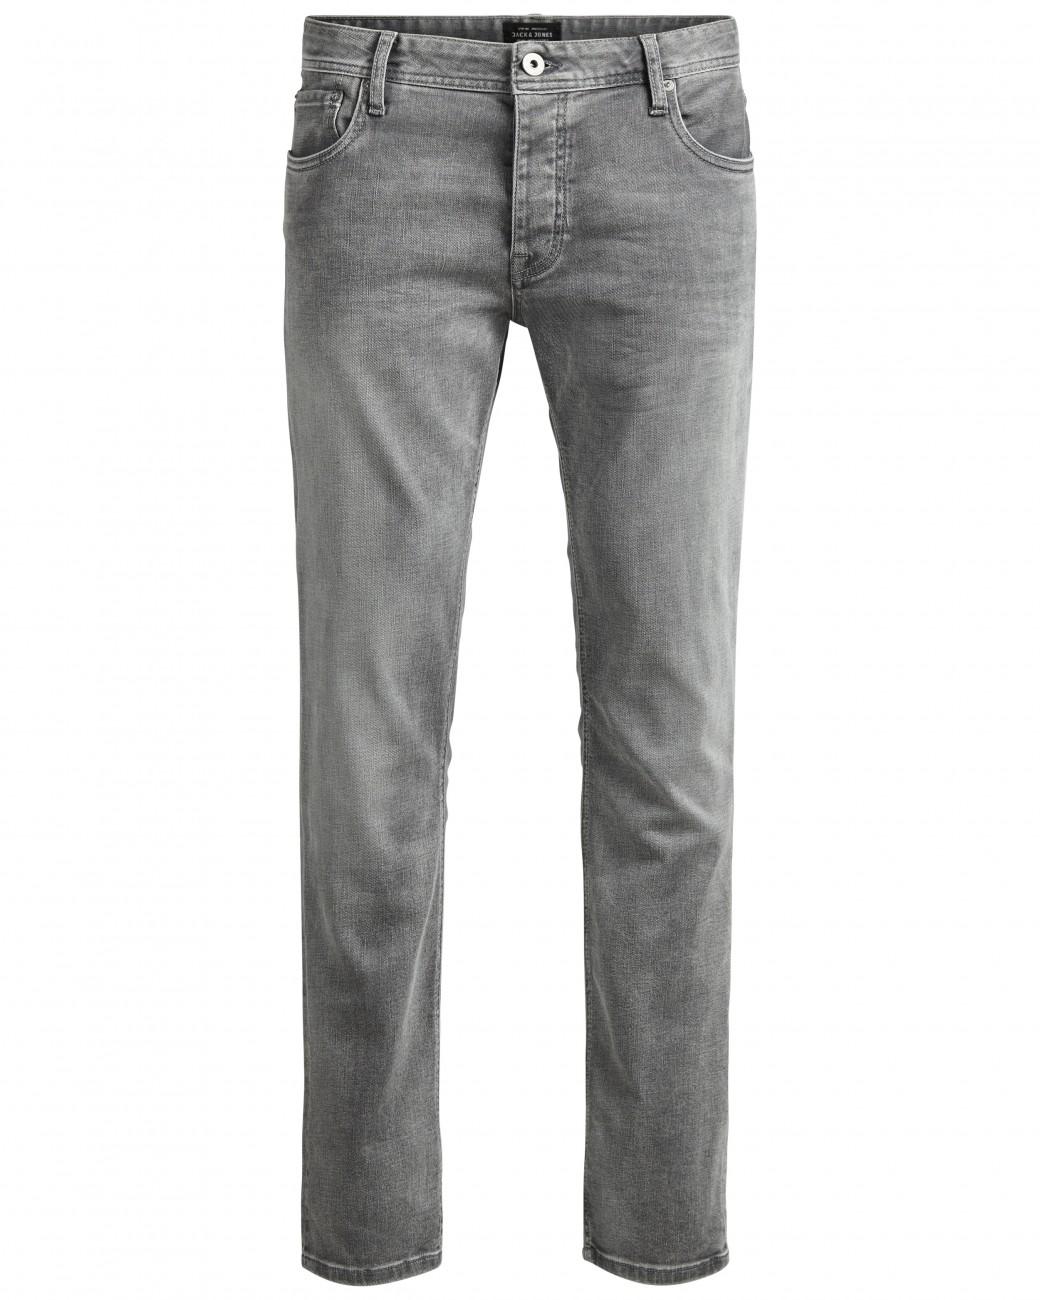 Graue Slim-Fit-Jeans I.Code oNRlFx